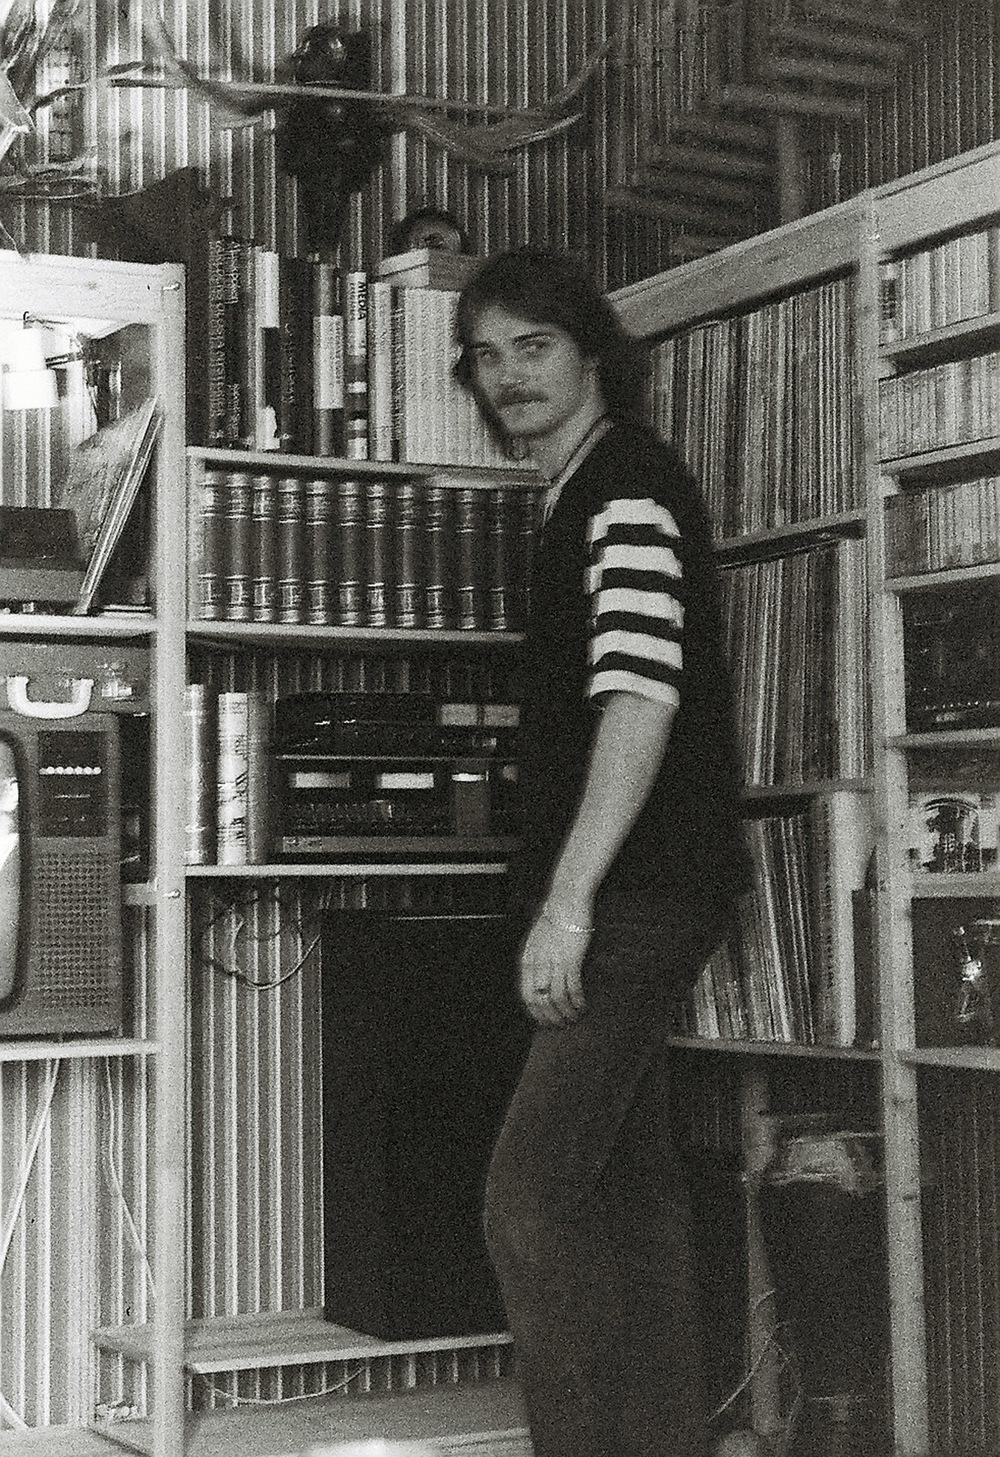 Markus  Gahnfelt Images - 1979-1982